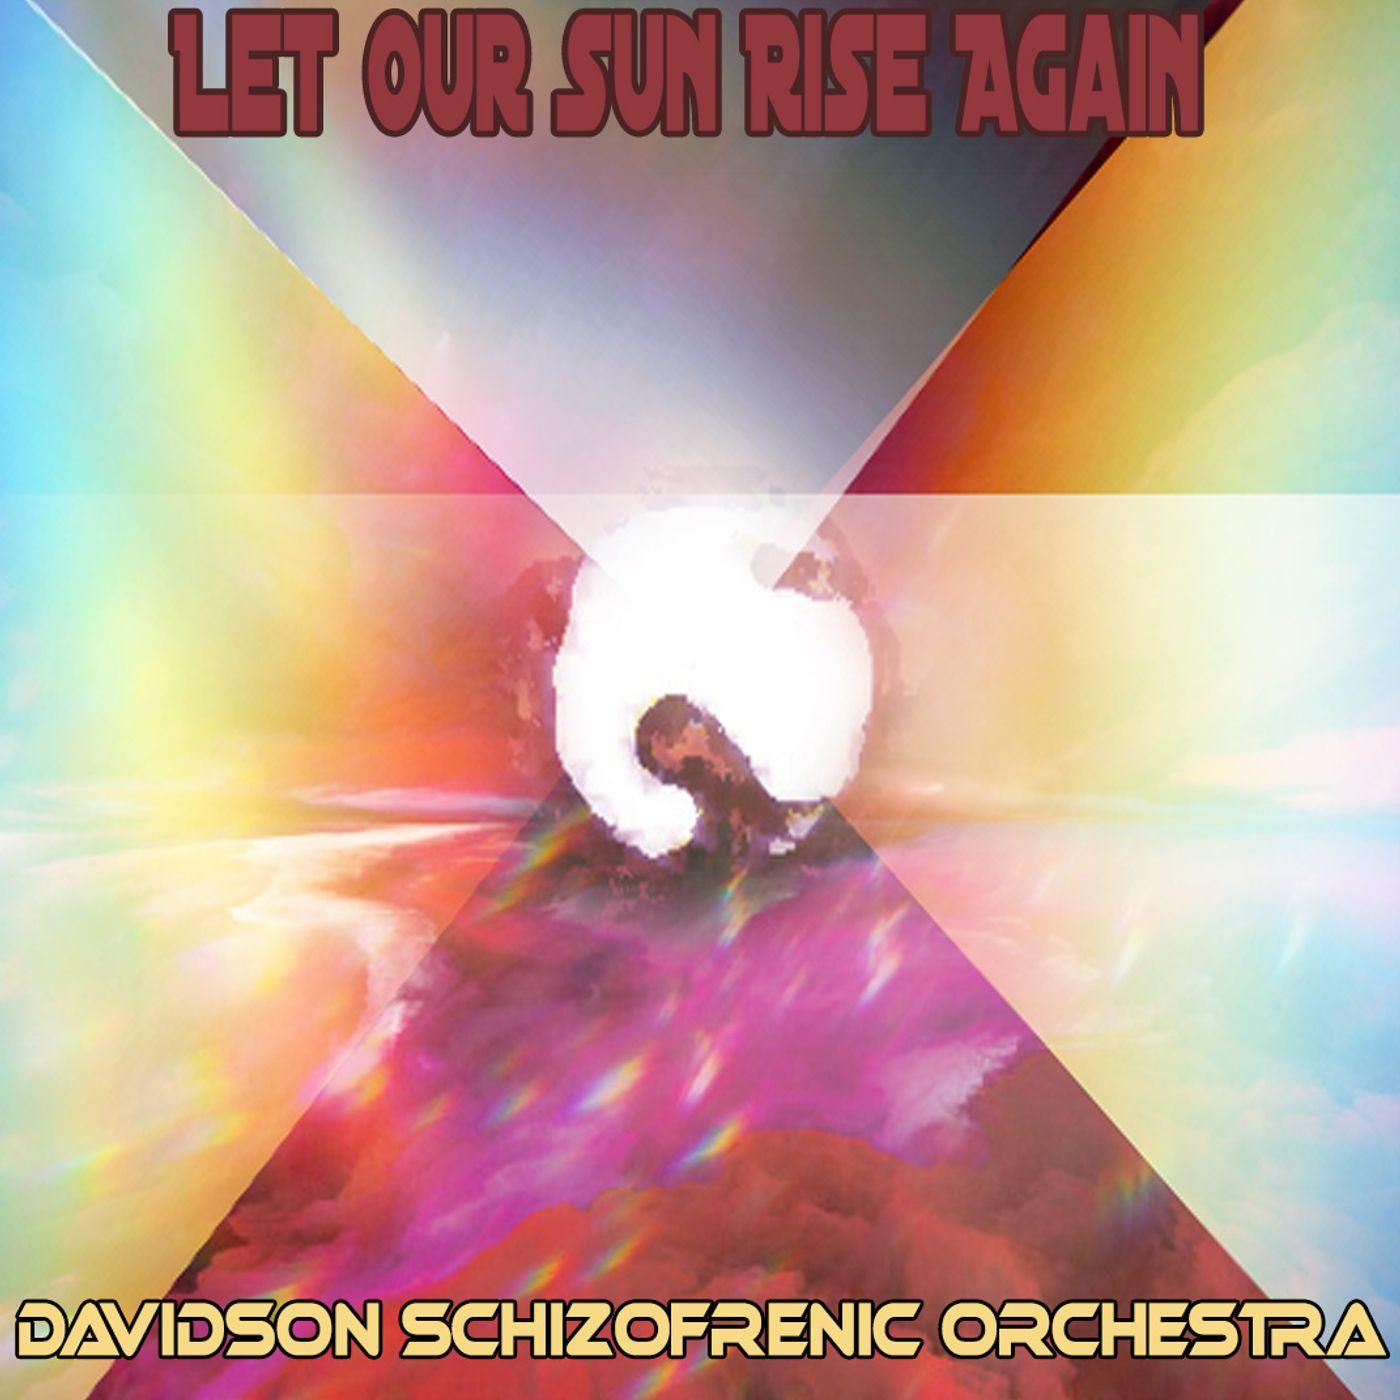 Let Our Sun Rise Again